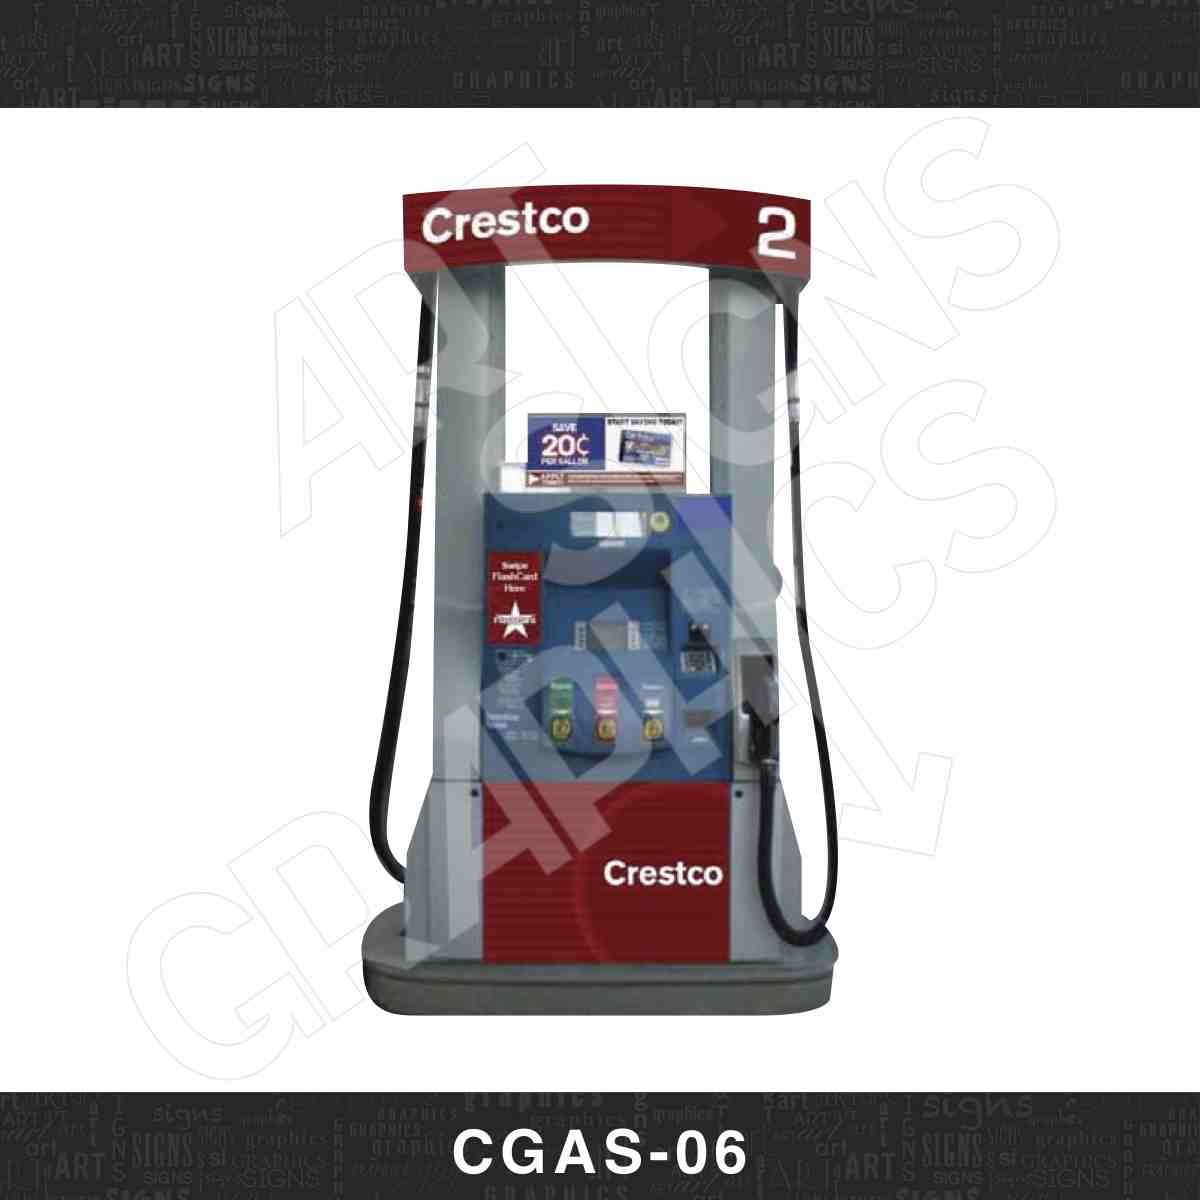 CGAS_06.jpg